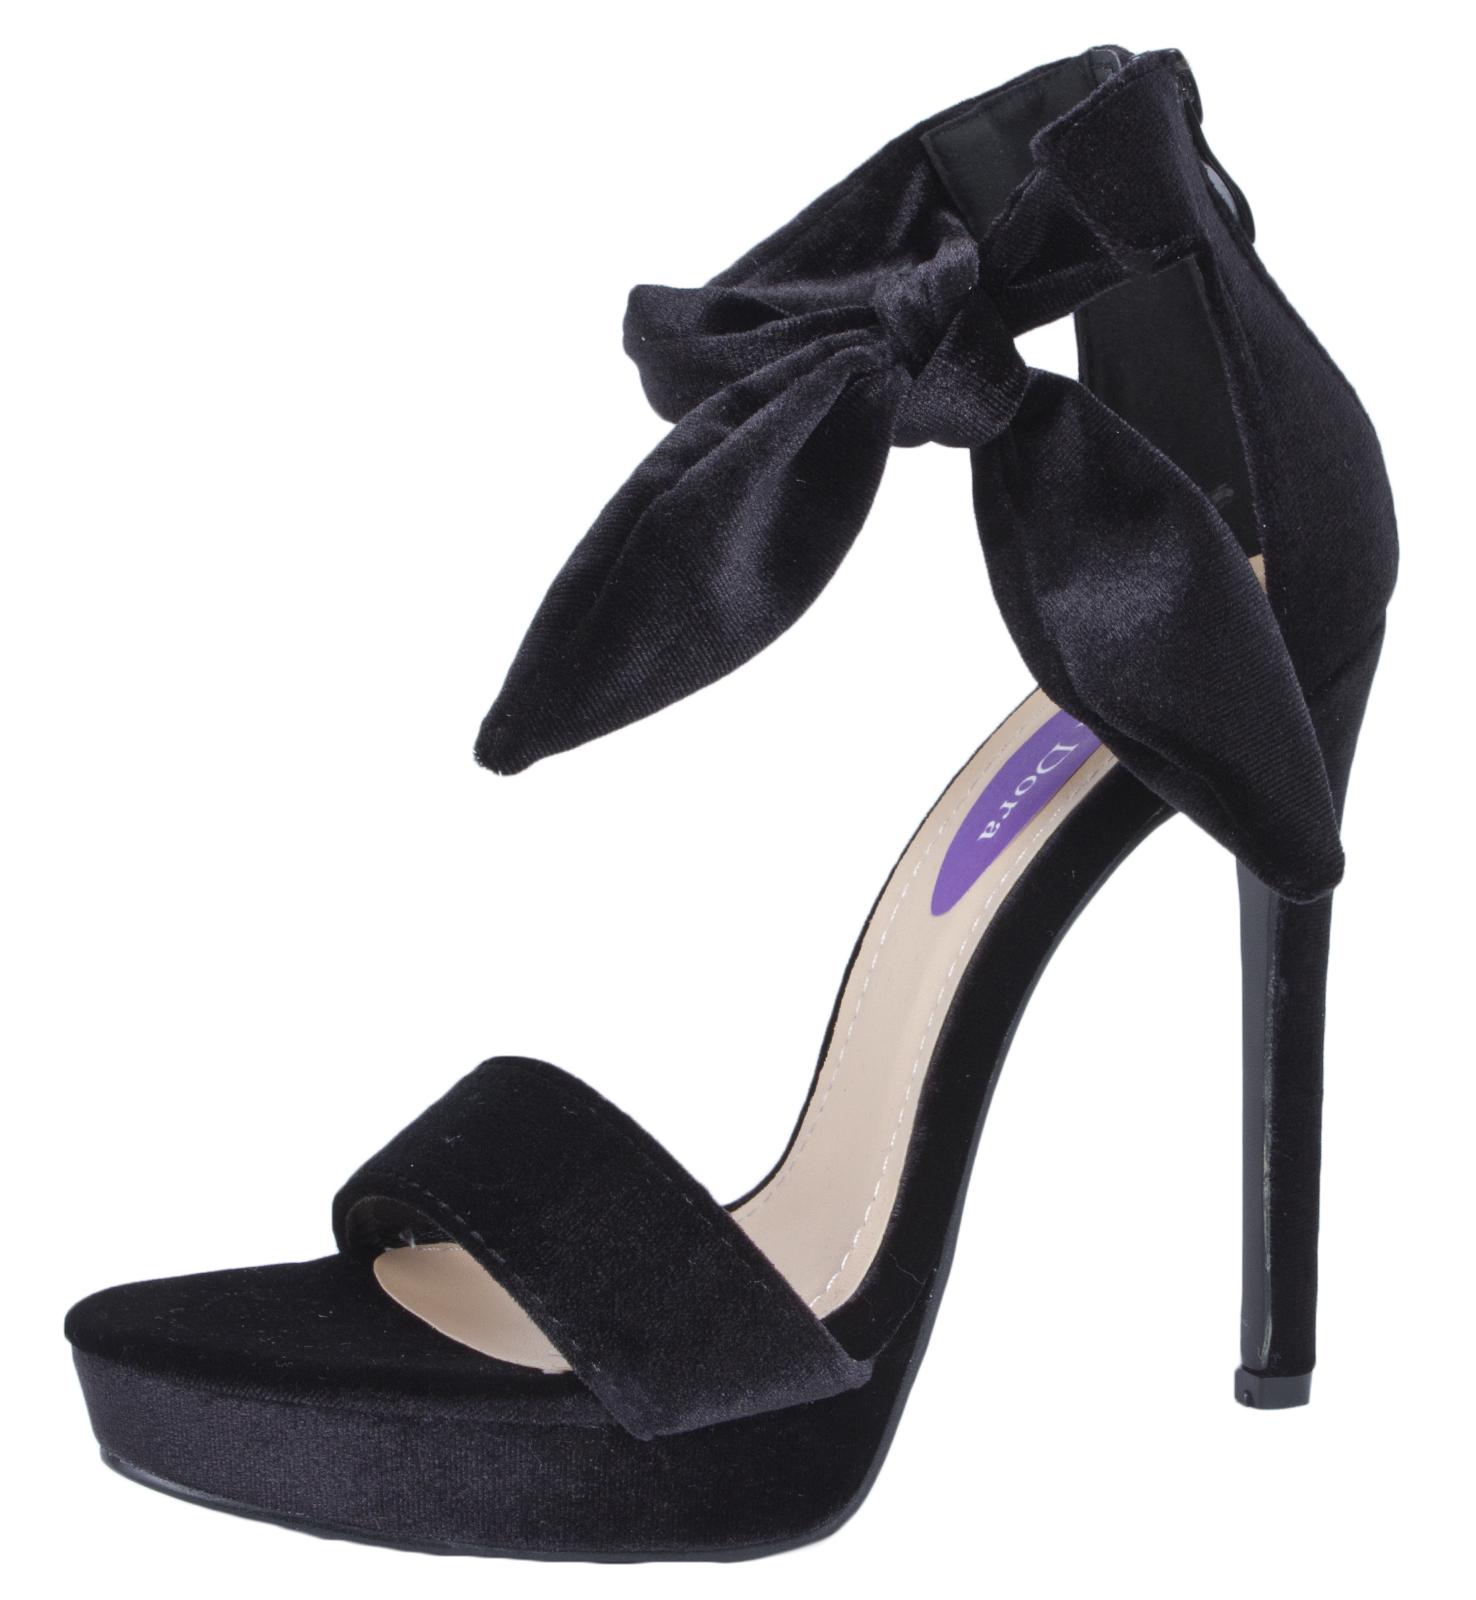 Stilettos shoes womens-velvet-high-heel-sandals-bow-ankle-wrap- IPAWOMF